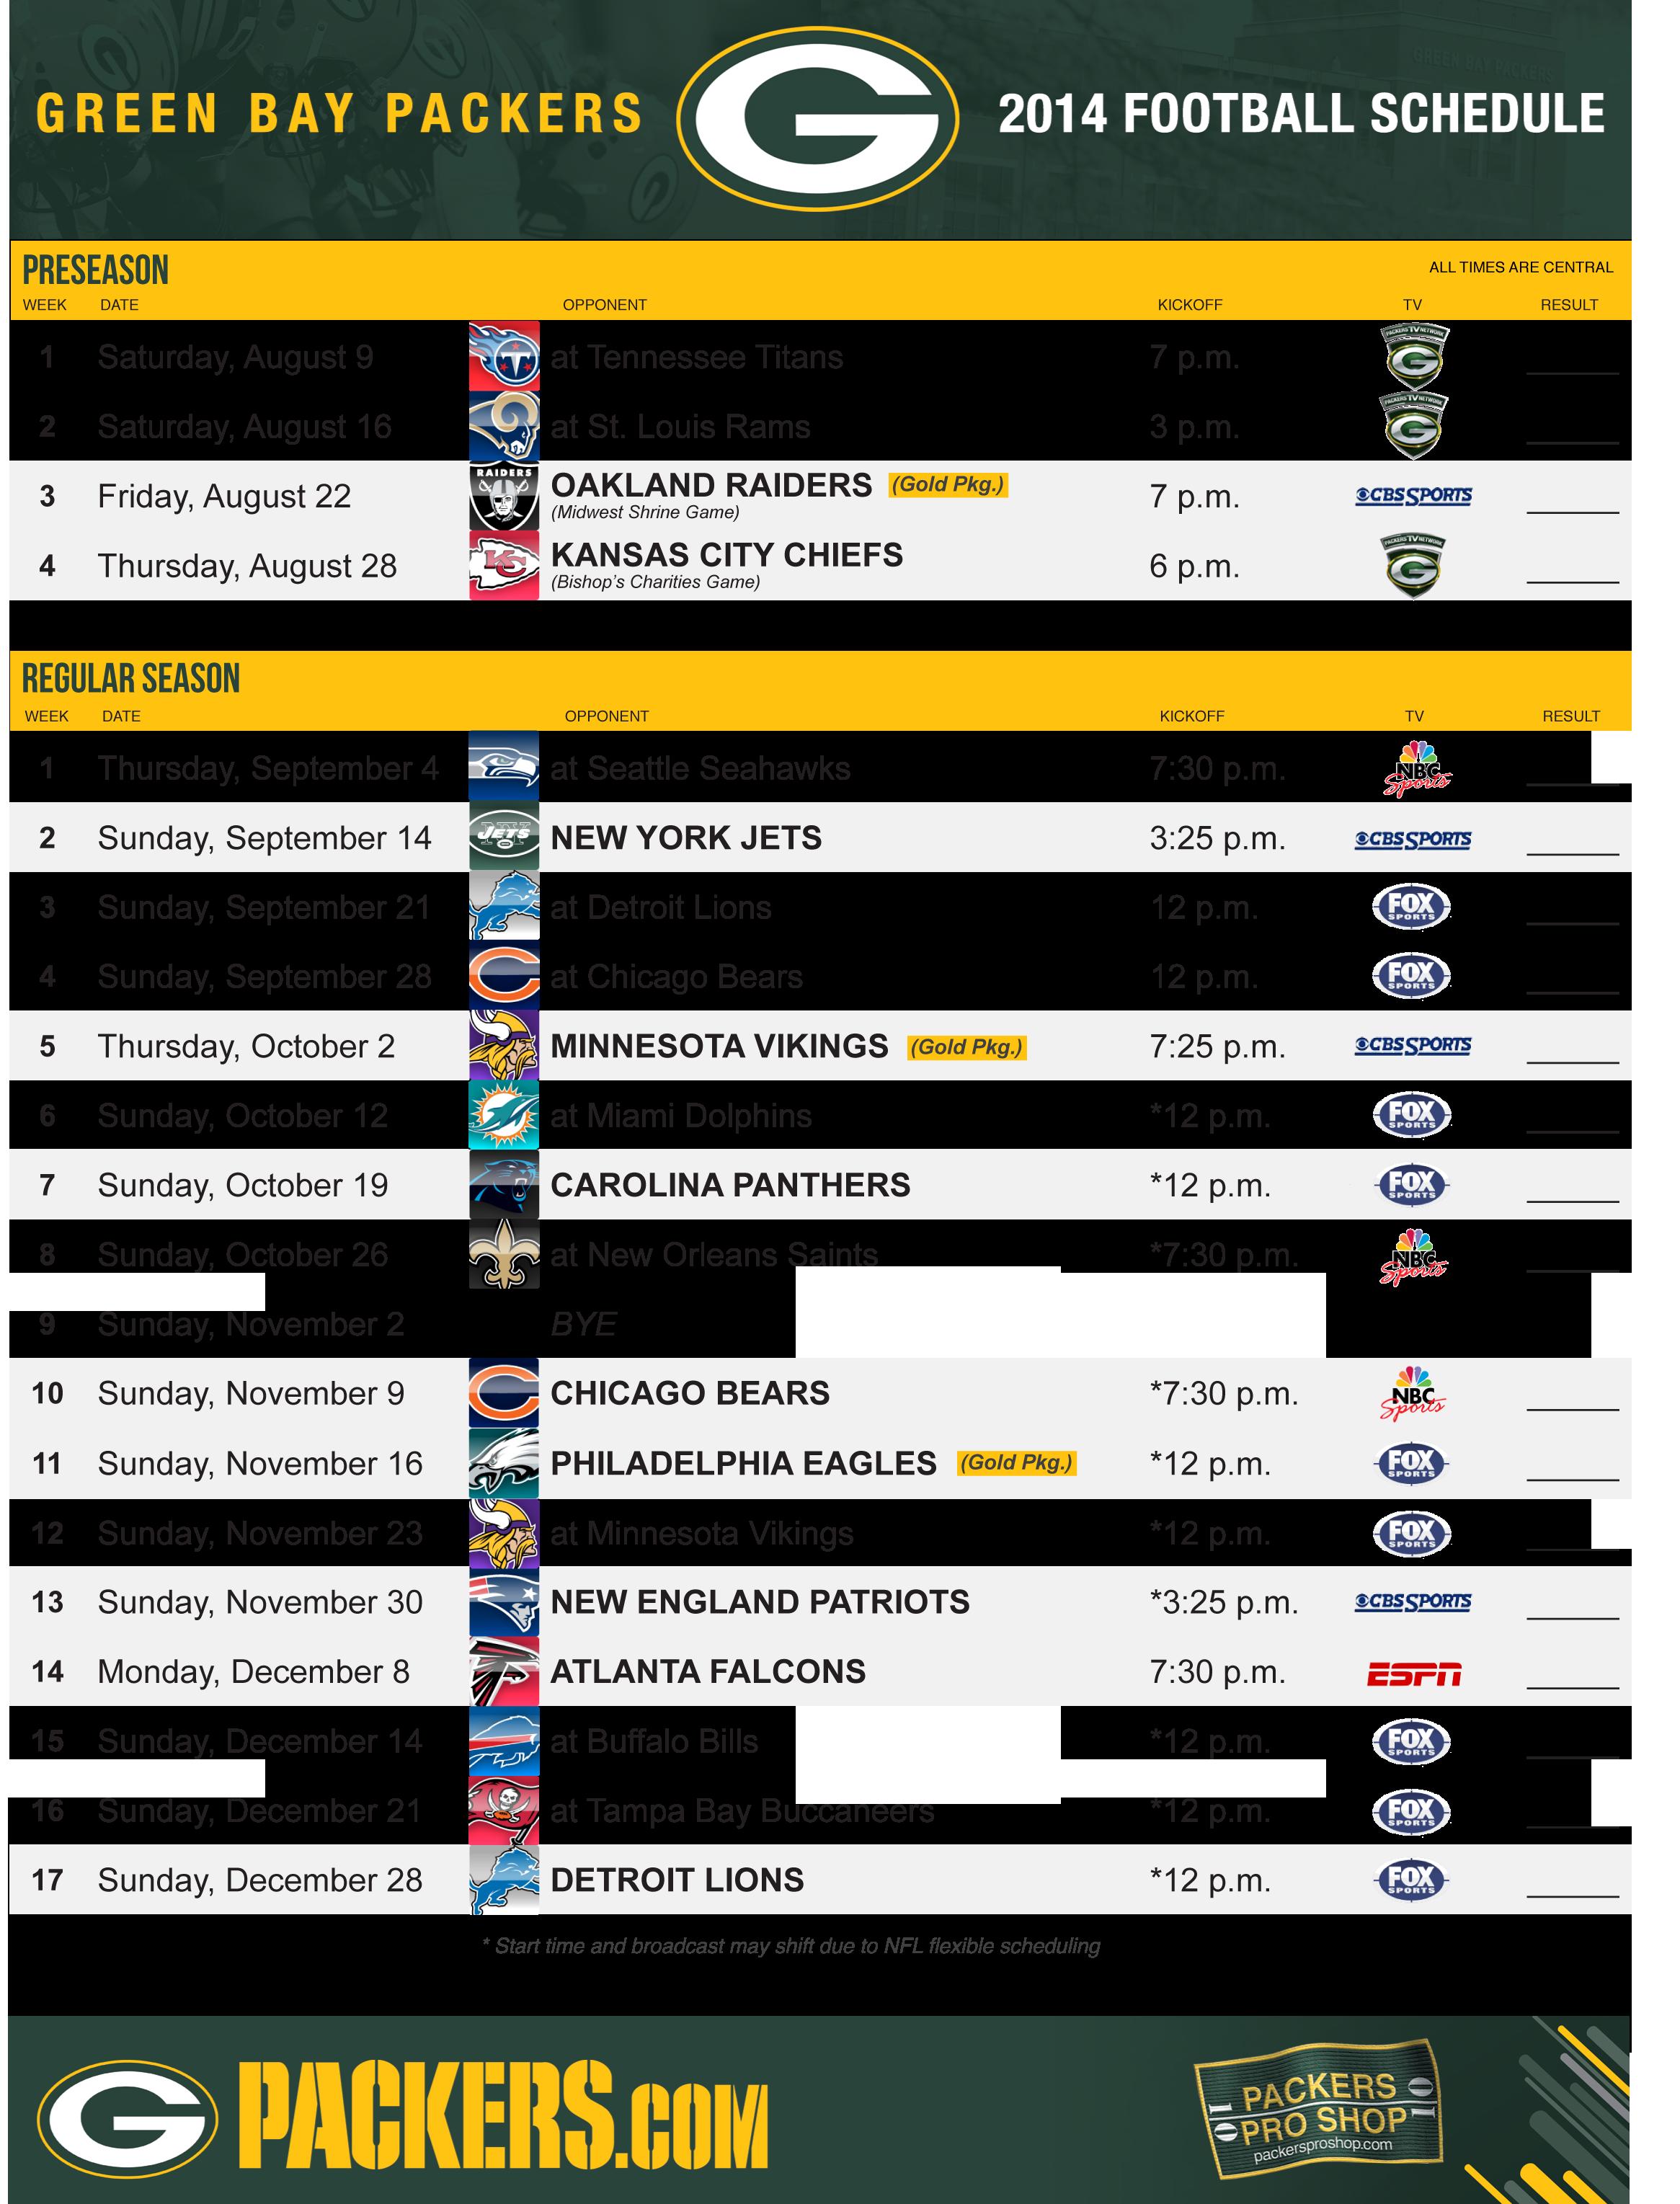 Packers 2014 Schedule Gopackgo Green Bay Packers Green Bay Green Bay Packers Players